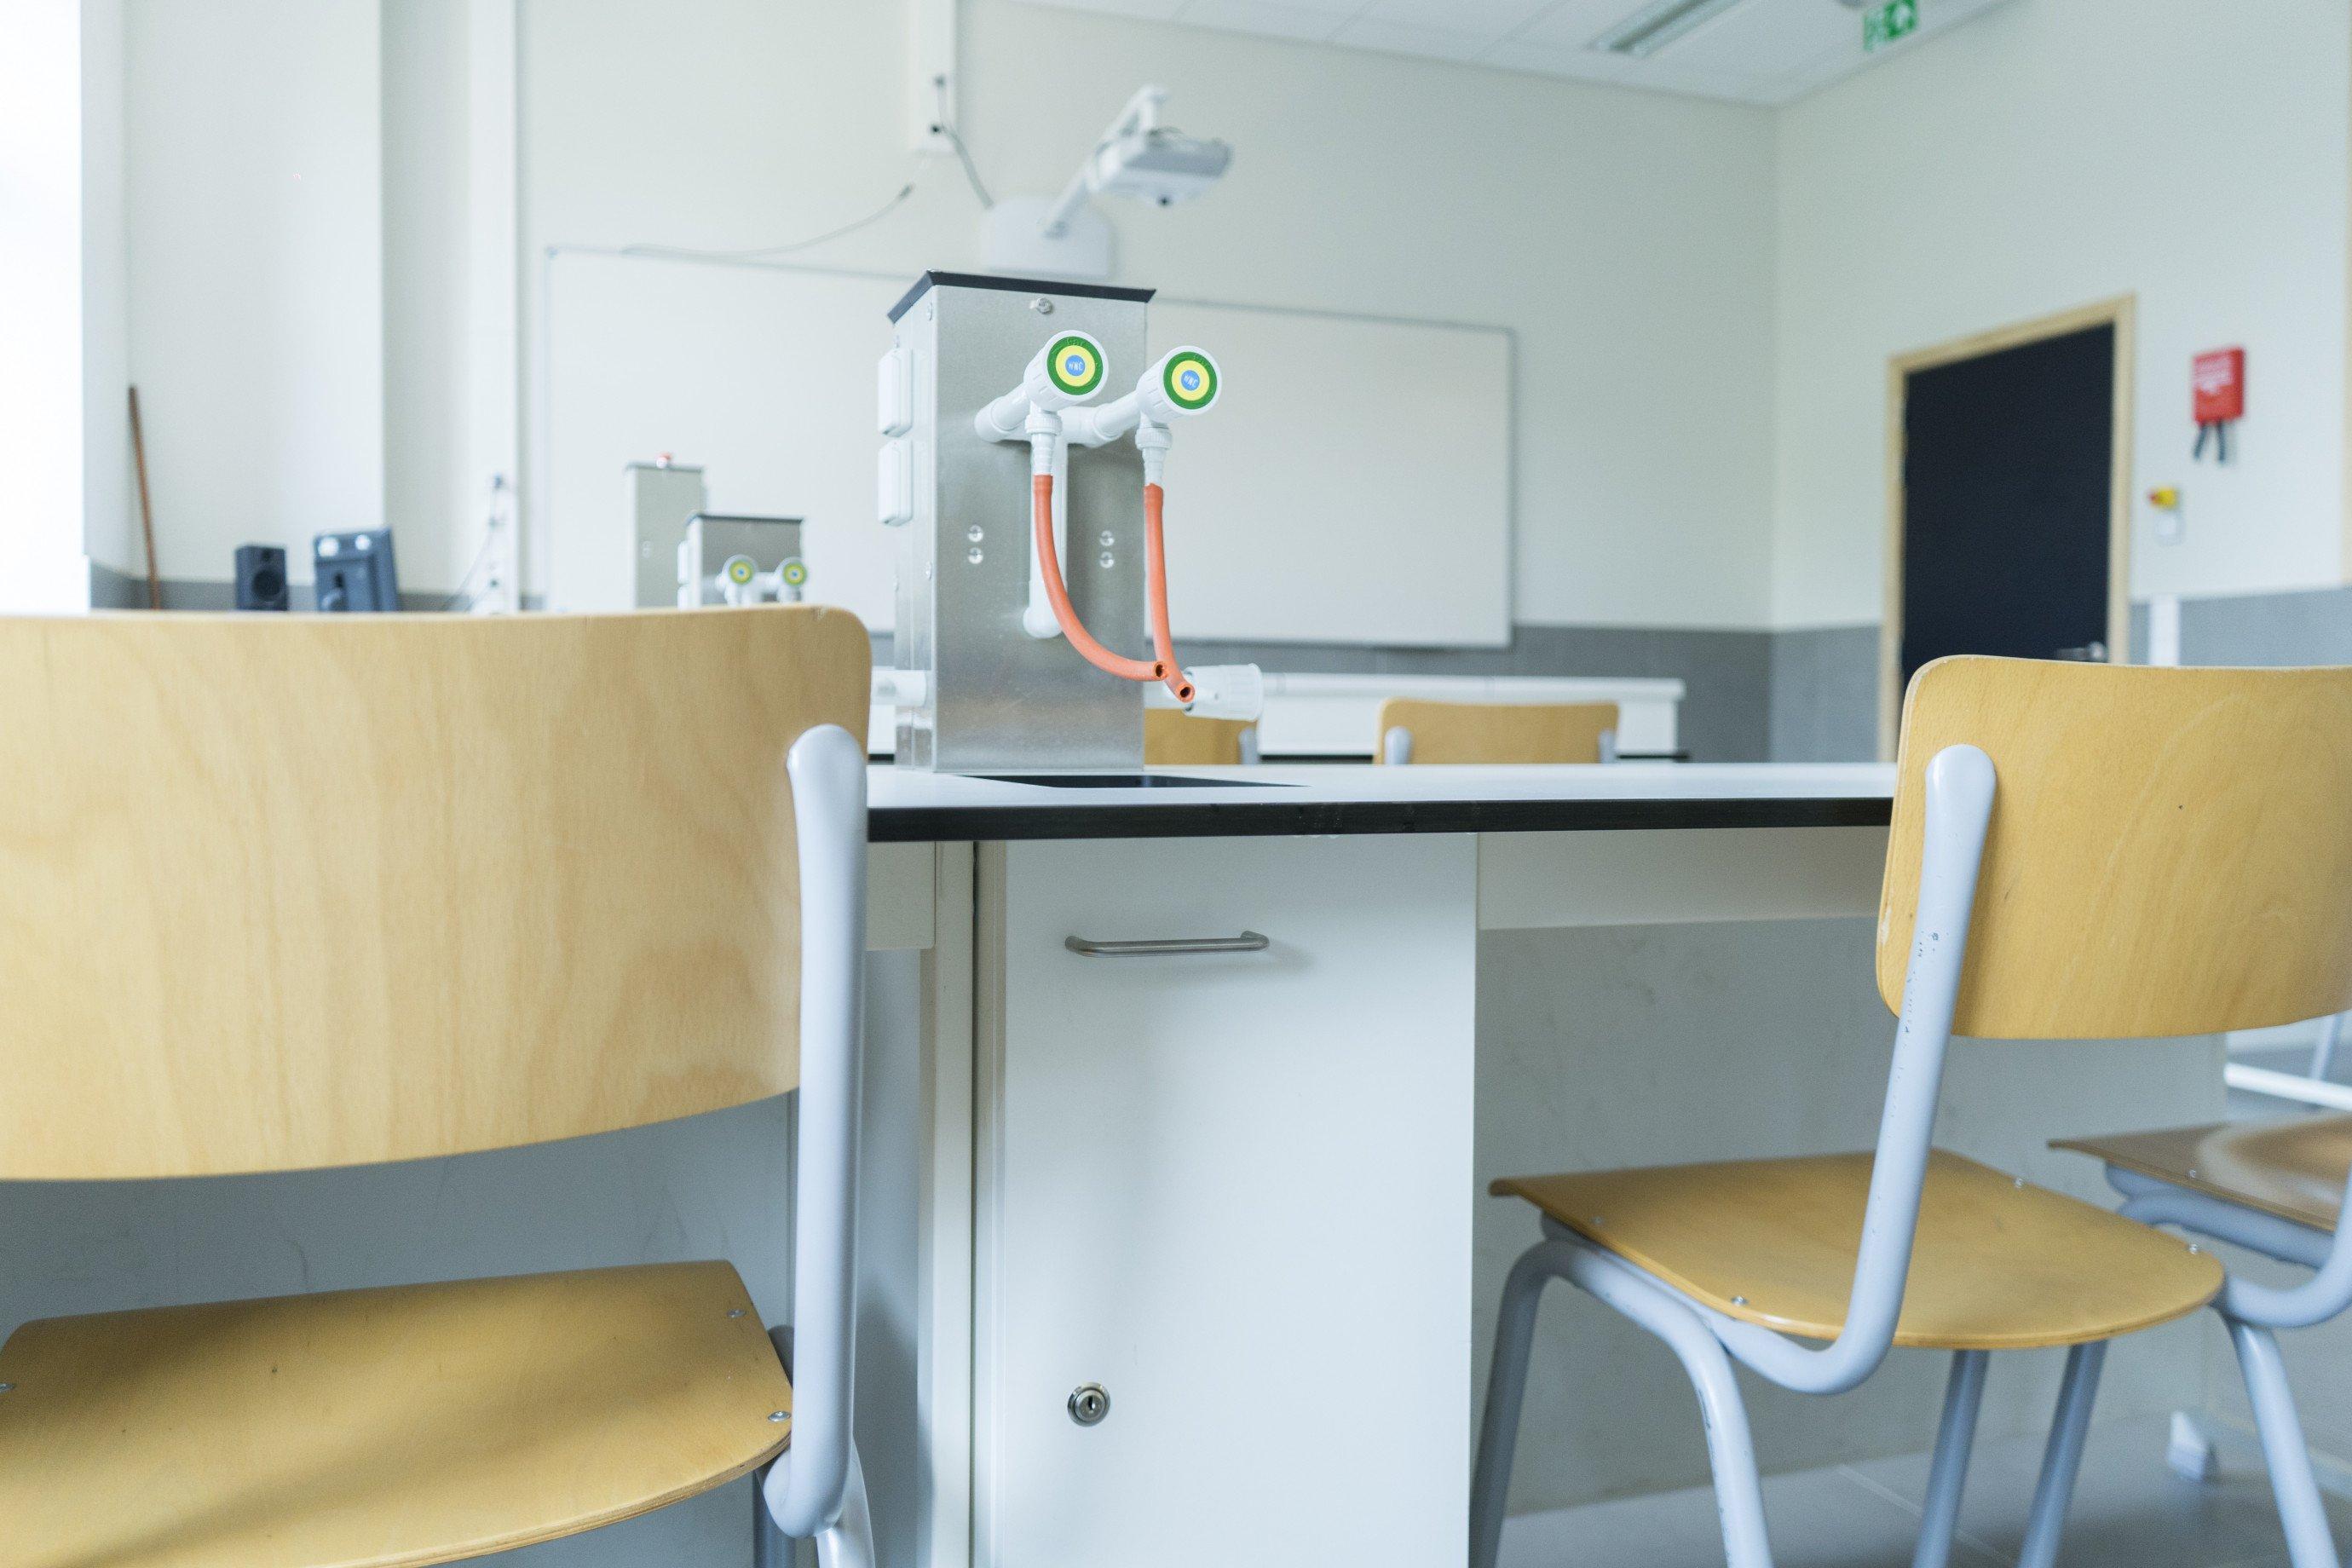 St.Ursula_Laboratoriummeubilair_5.jpg